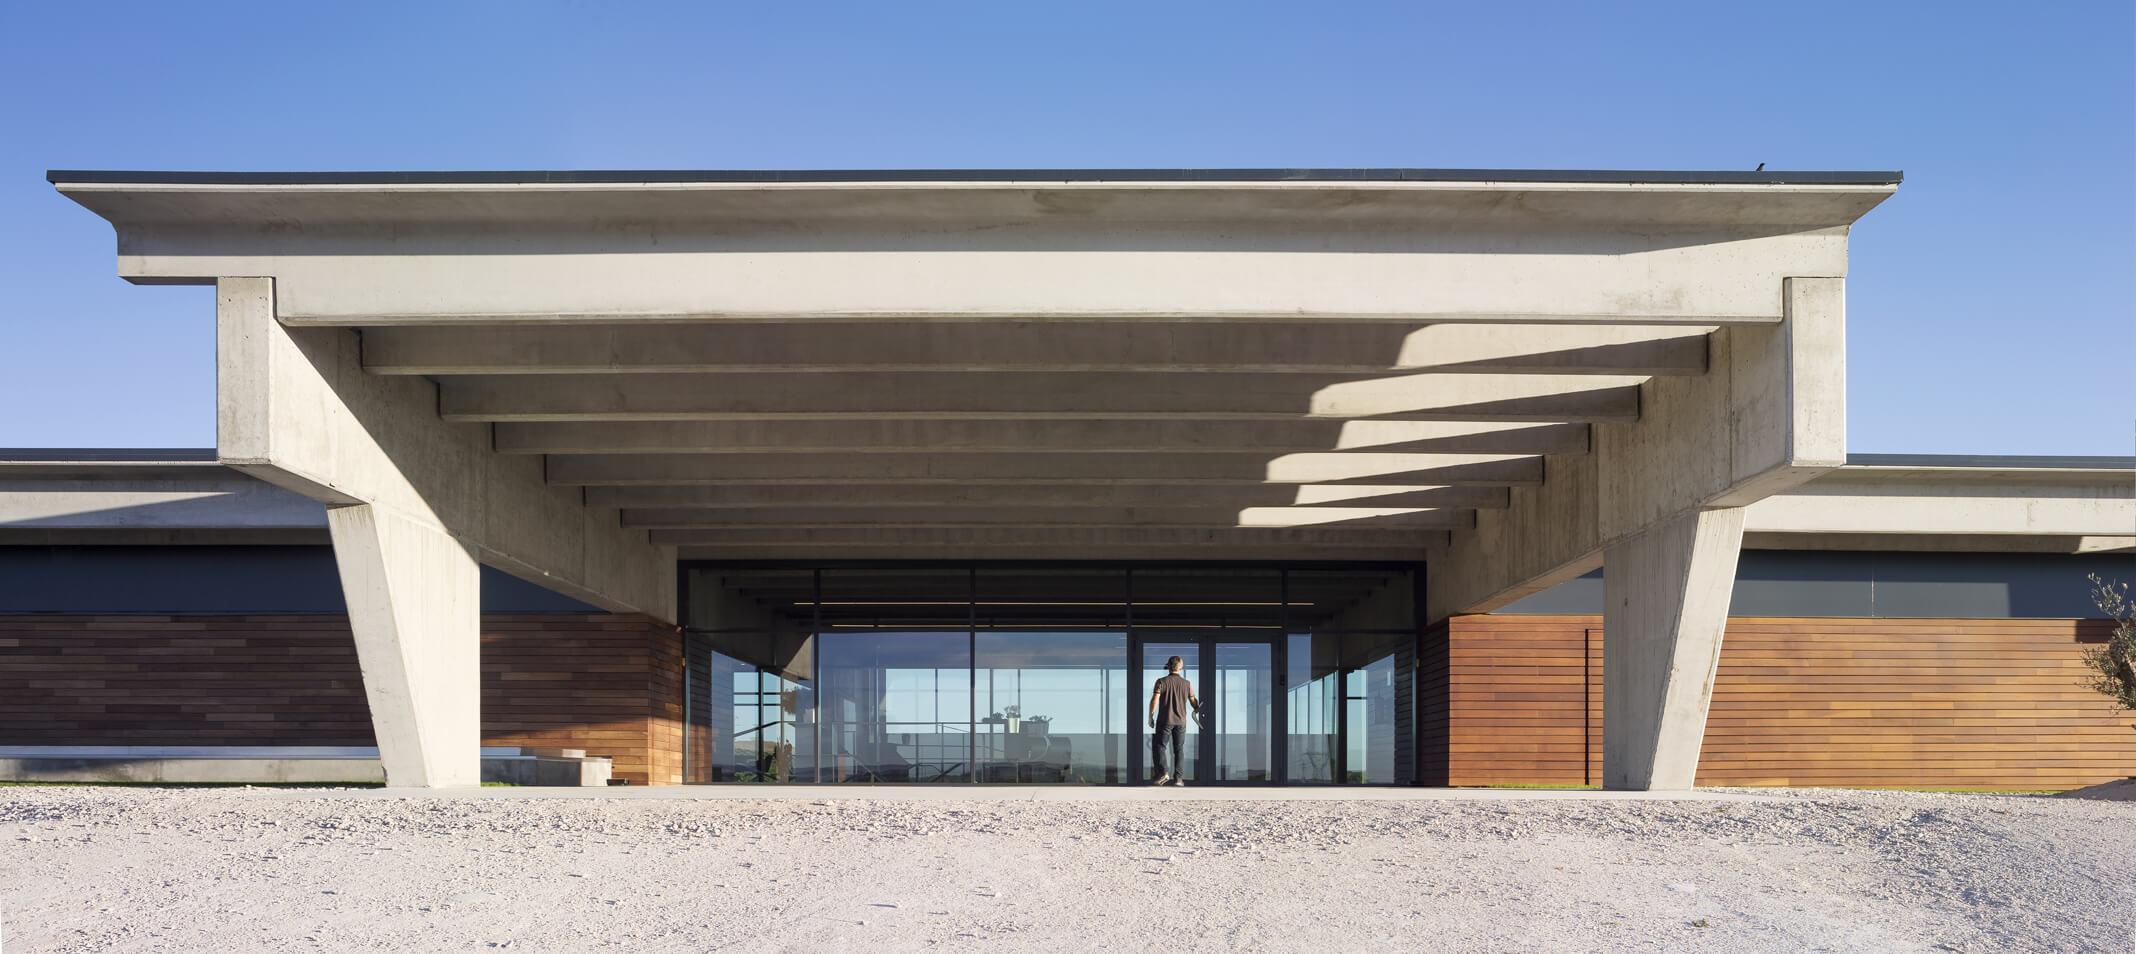 Bodega Beronia Rueda- Idom Arquitectos 4